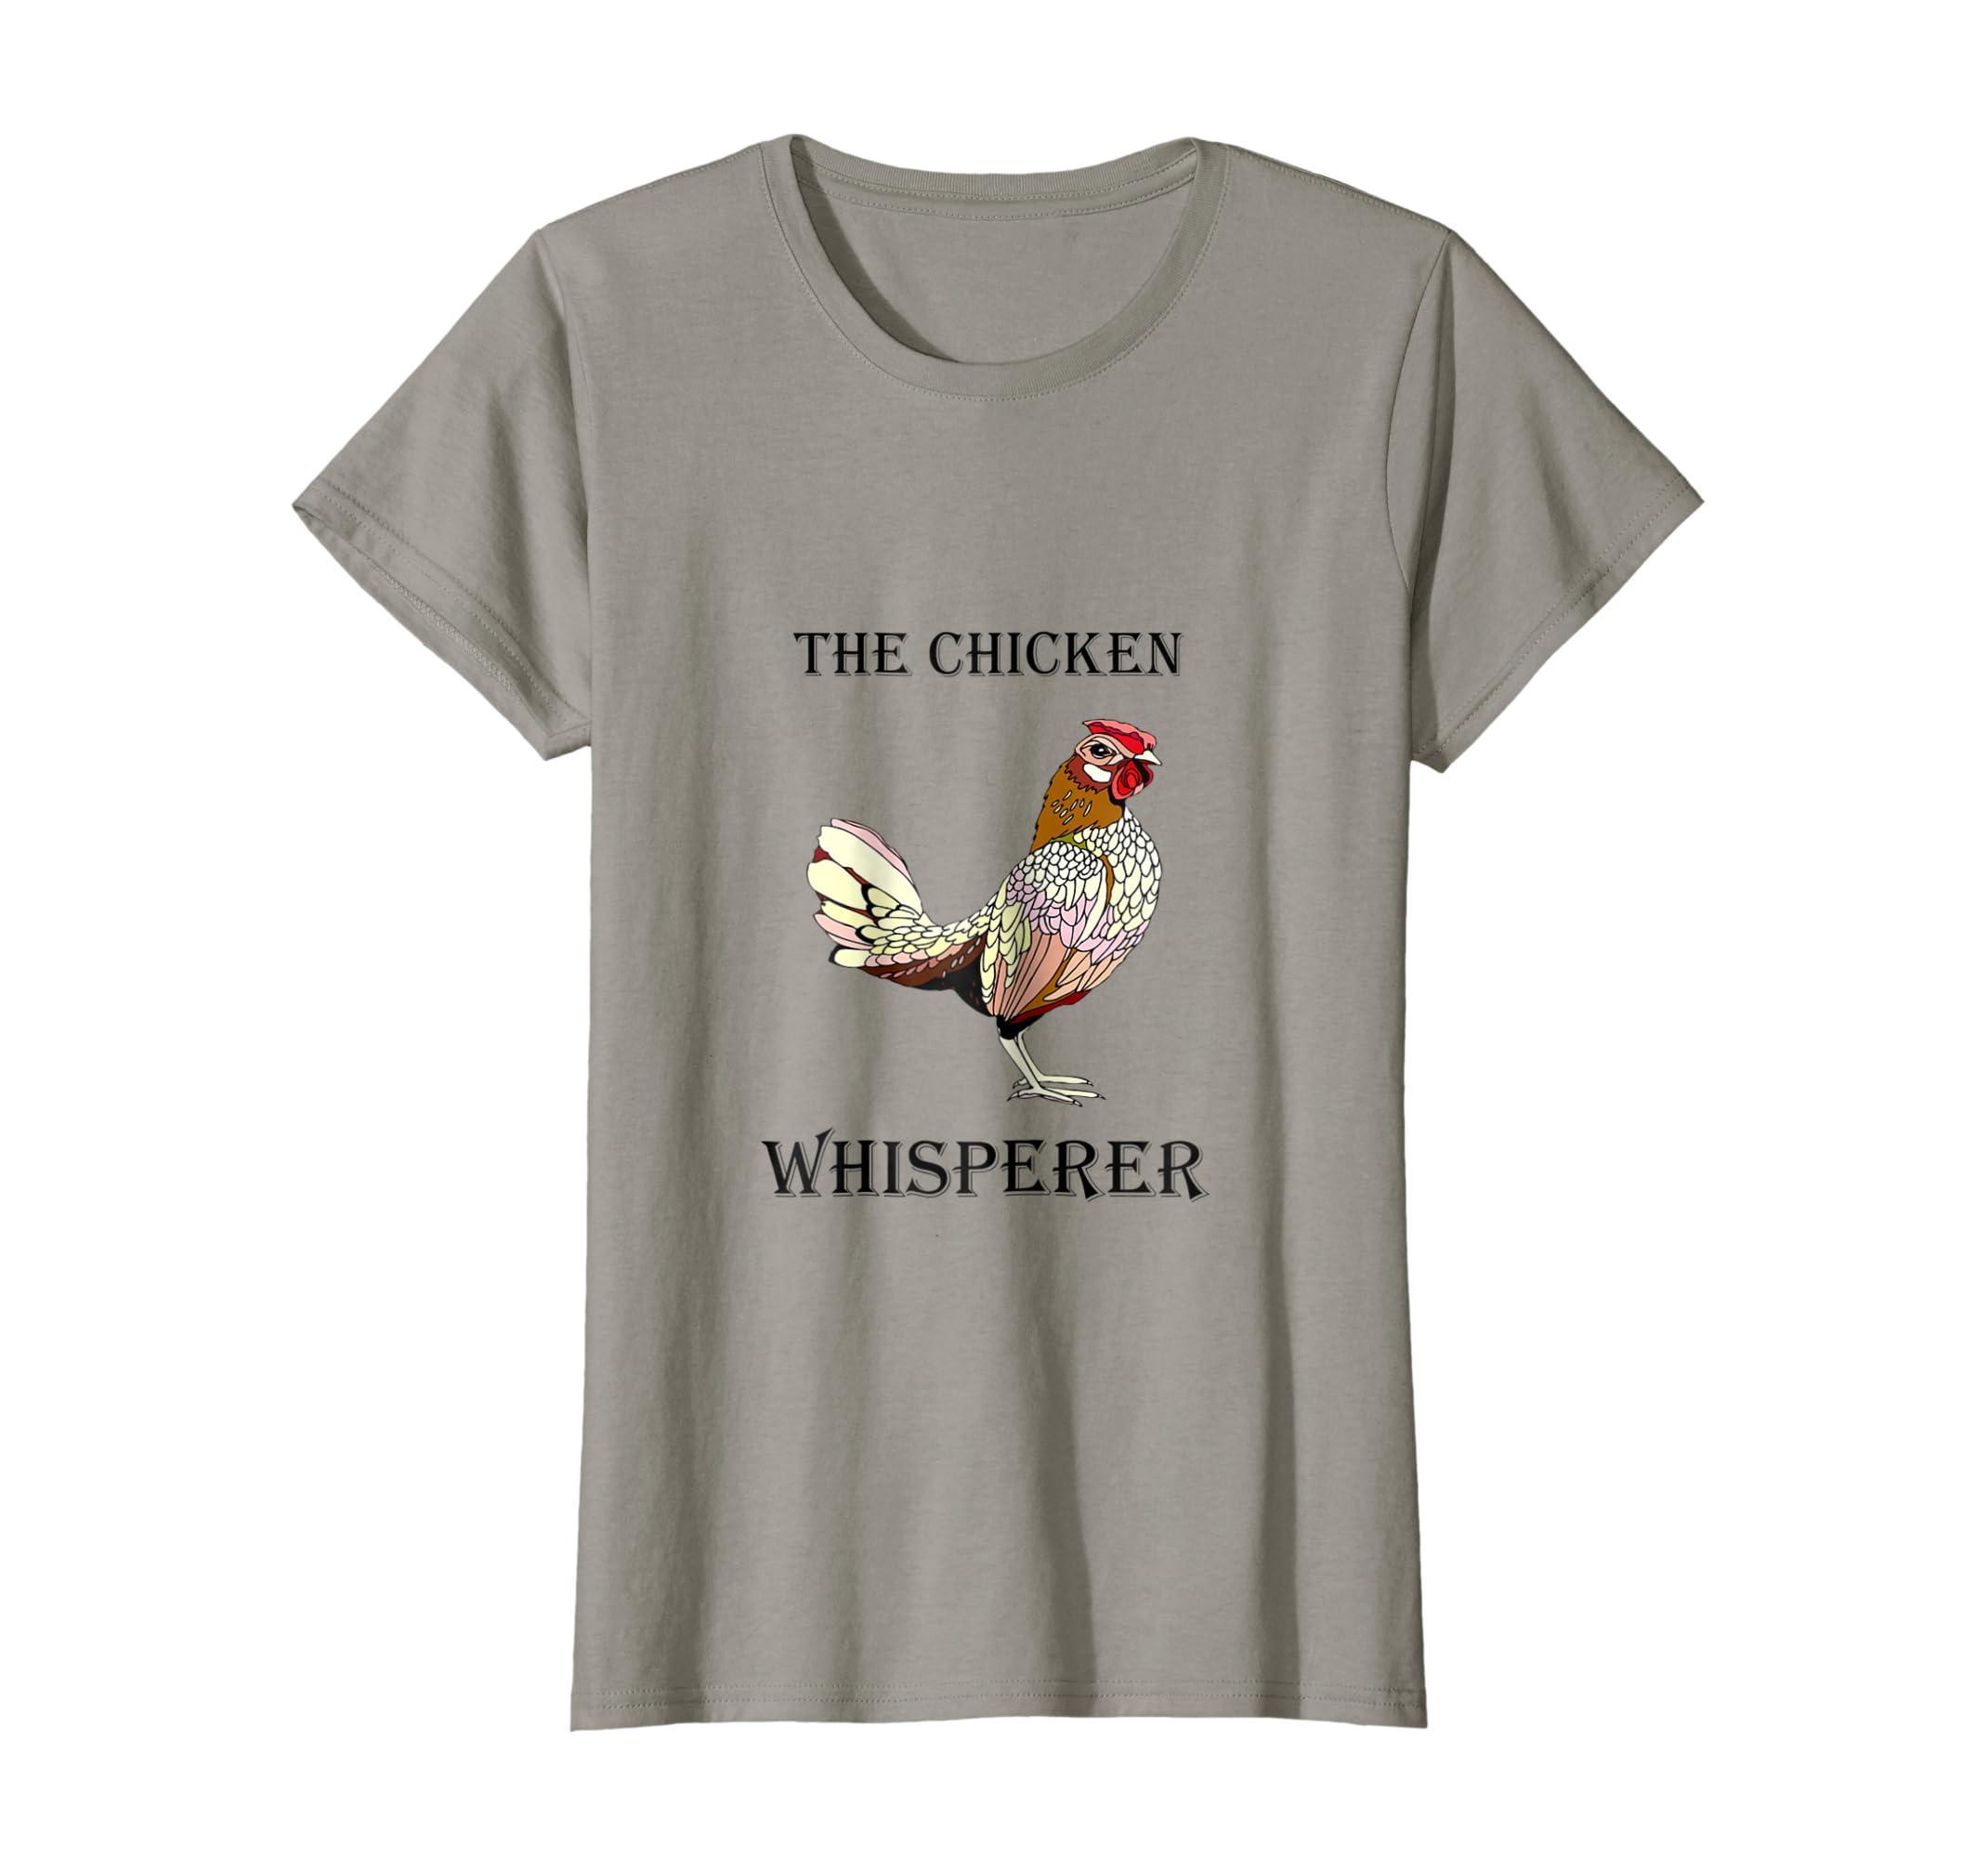 1a89c1523 Amazon.com: The Chicken Whisperer Funny Farmer / Farming T-Shirt: Clothing